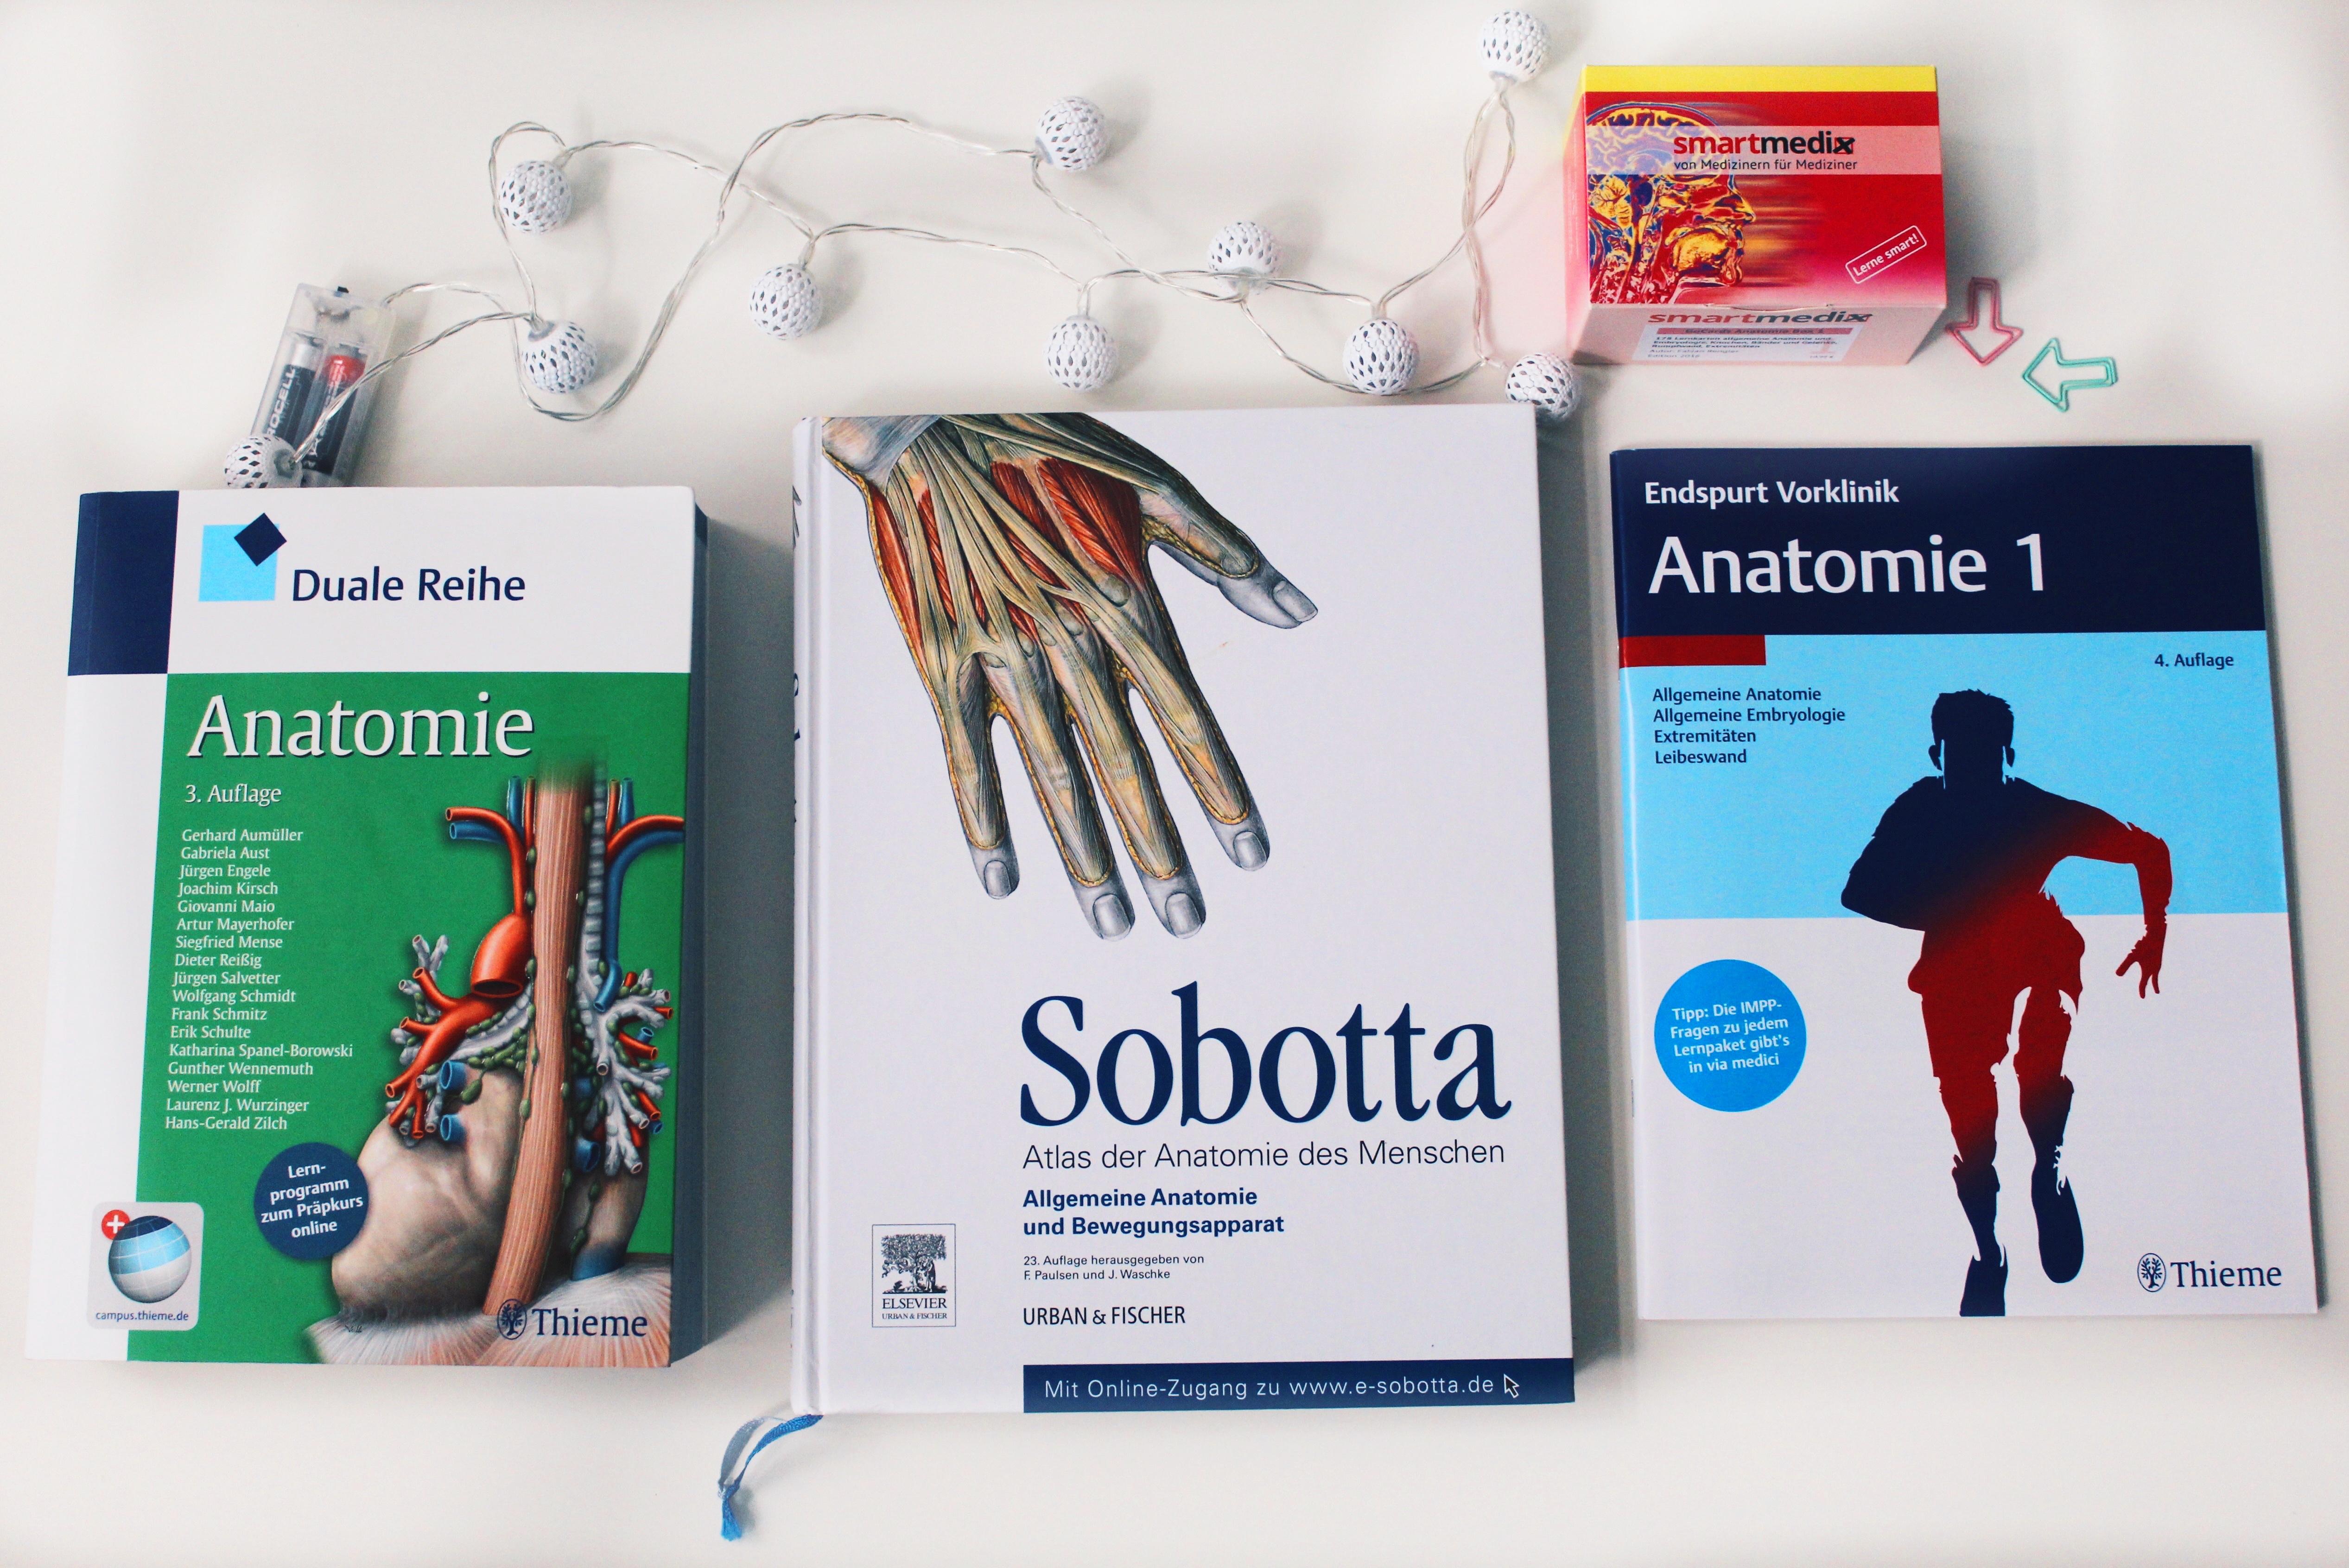 Das 2. Semester Medizinstudium an der Uni Leipzig